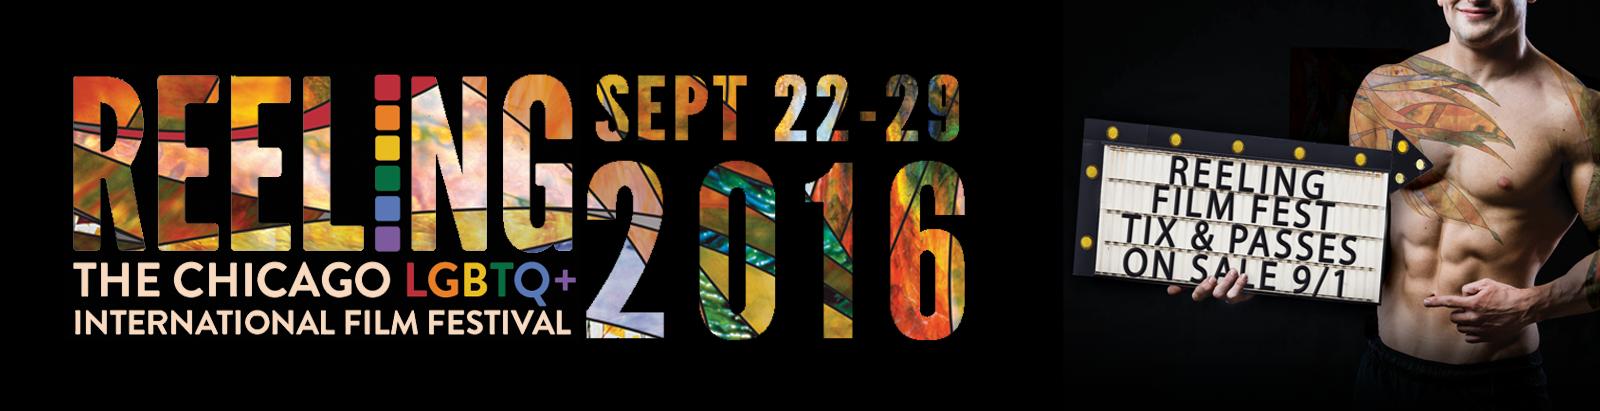 REELING2016: The 34th Chicago LGBTQ+ International Film Festival